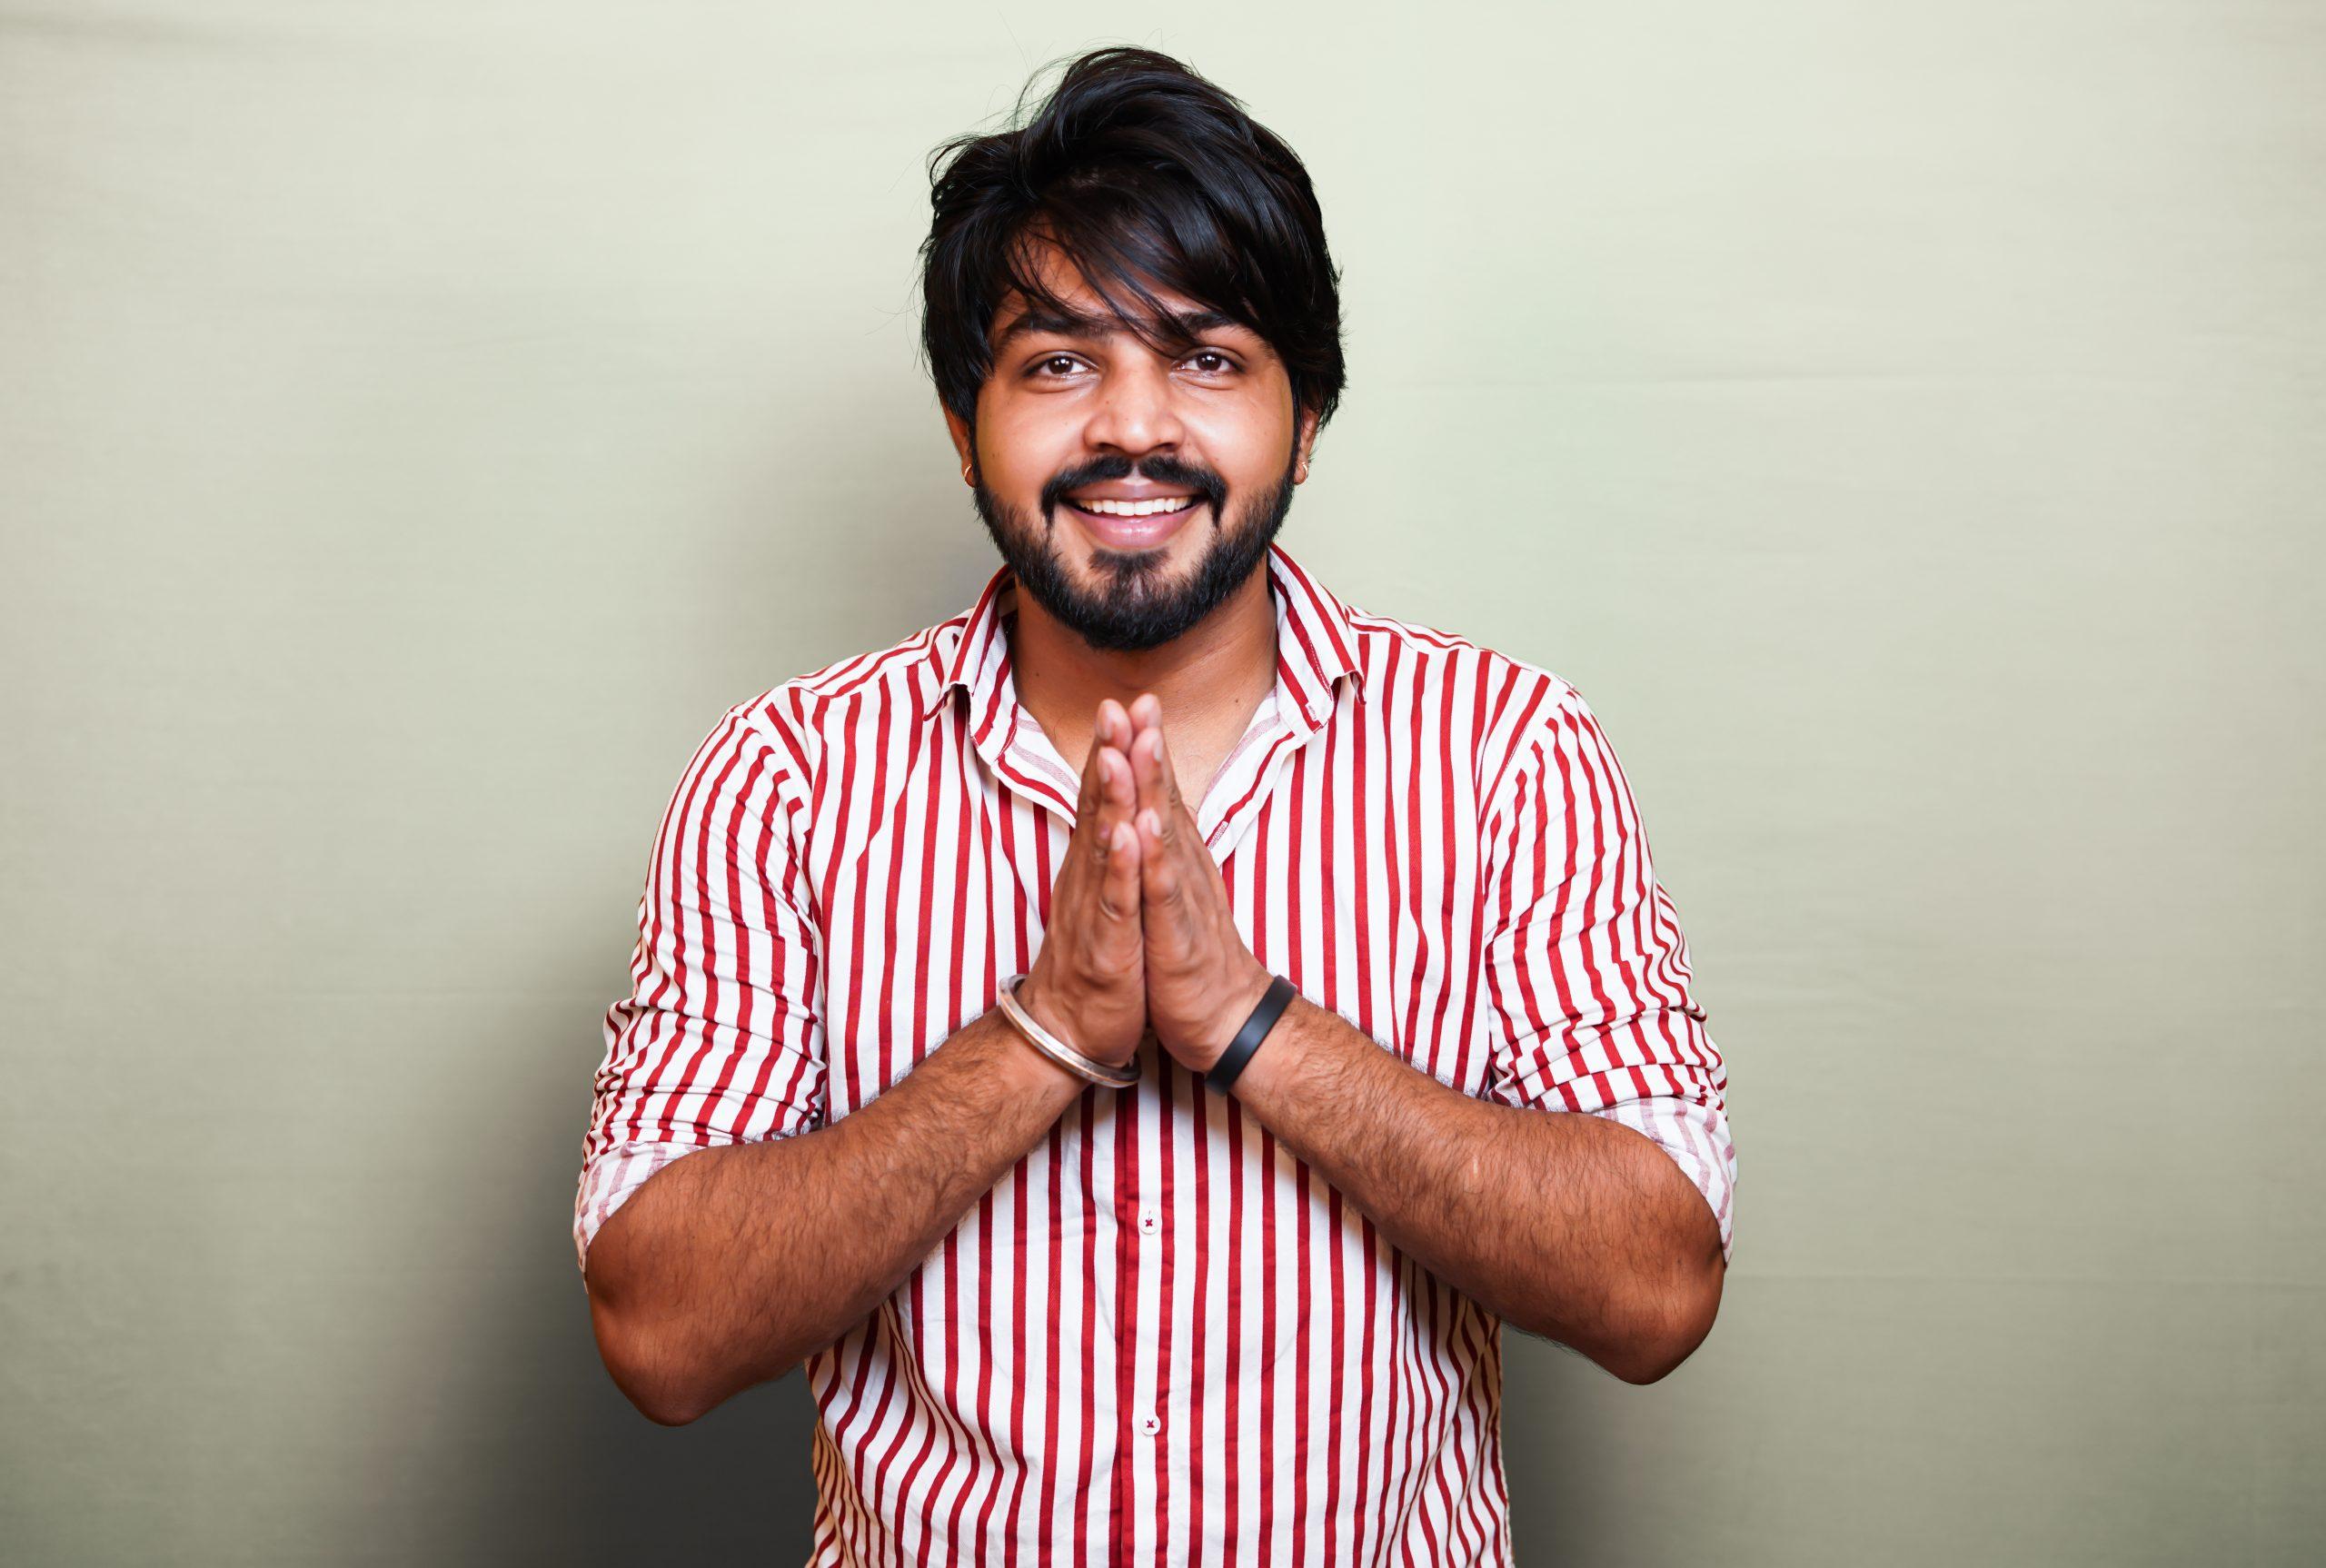 Man folding hands in Namaste